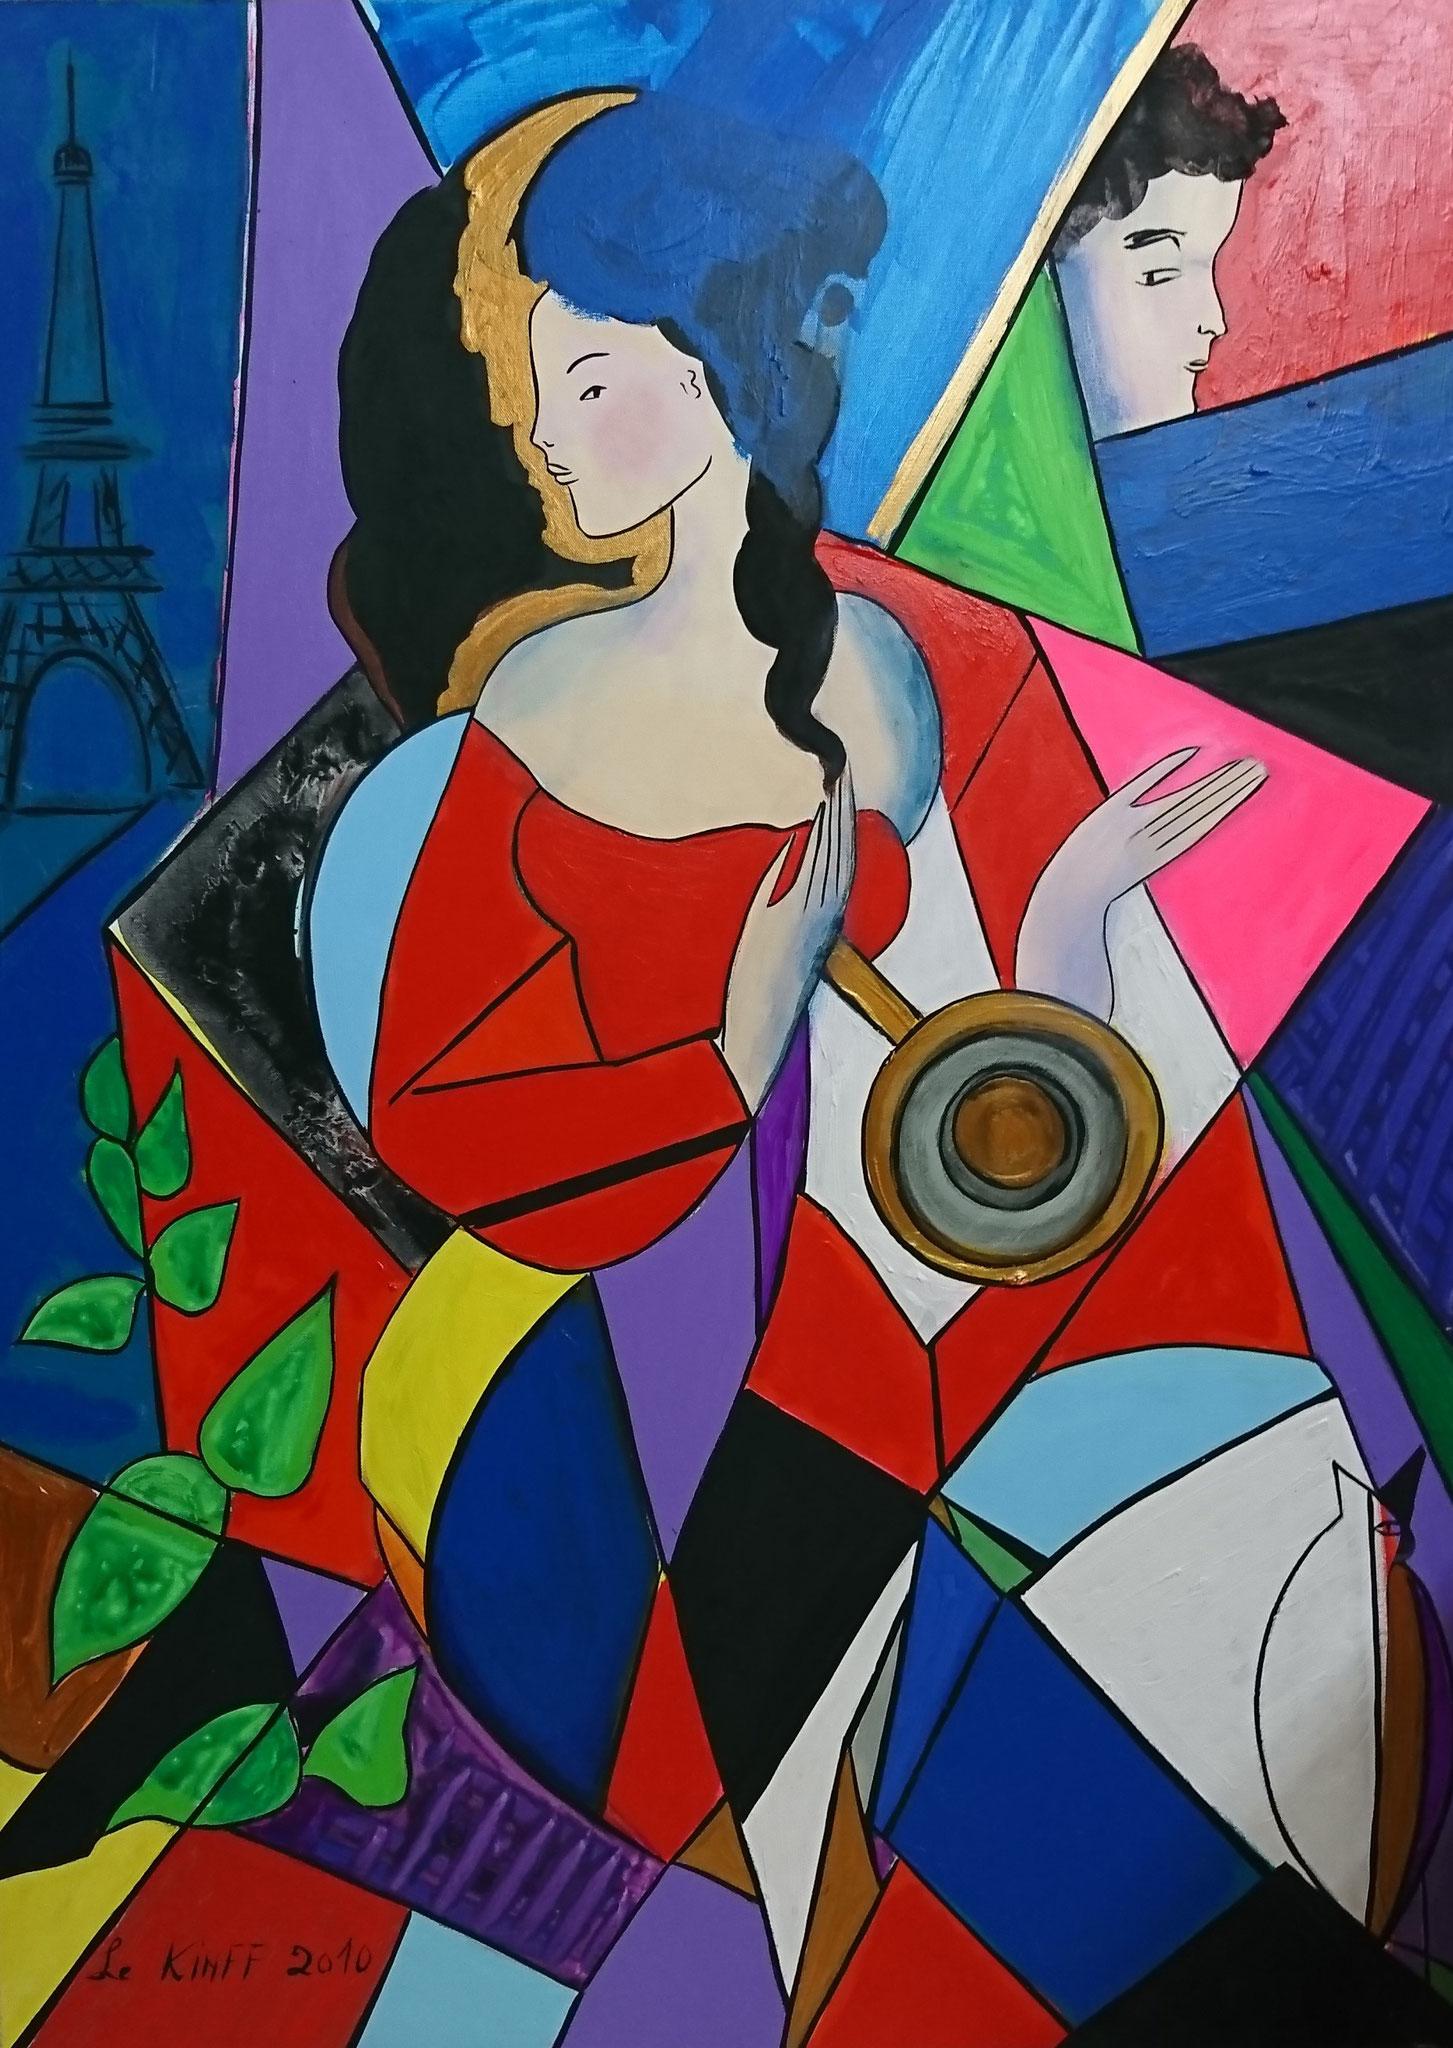 Chérie bibi et la grande brune. 60F. canvas. 2010